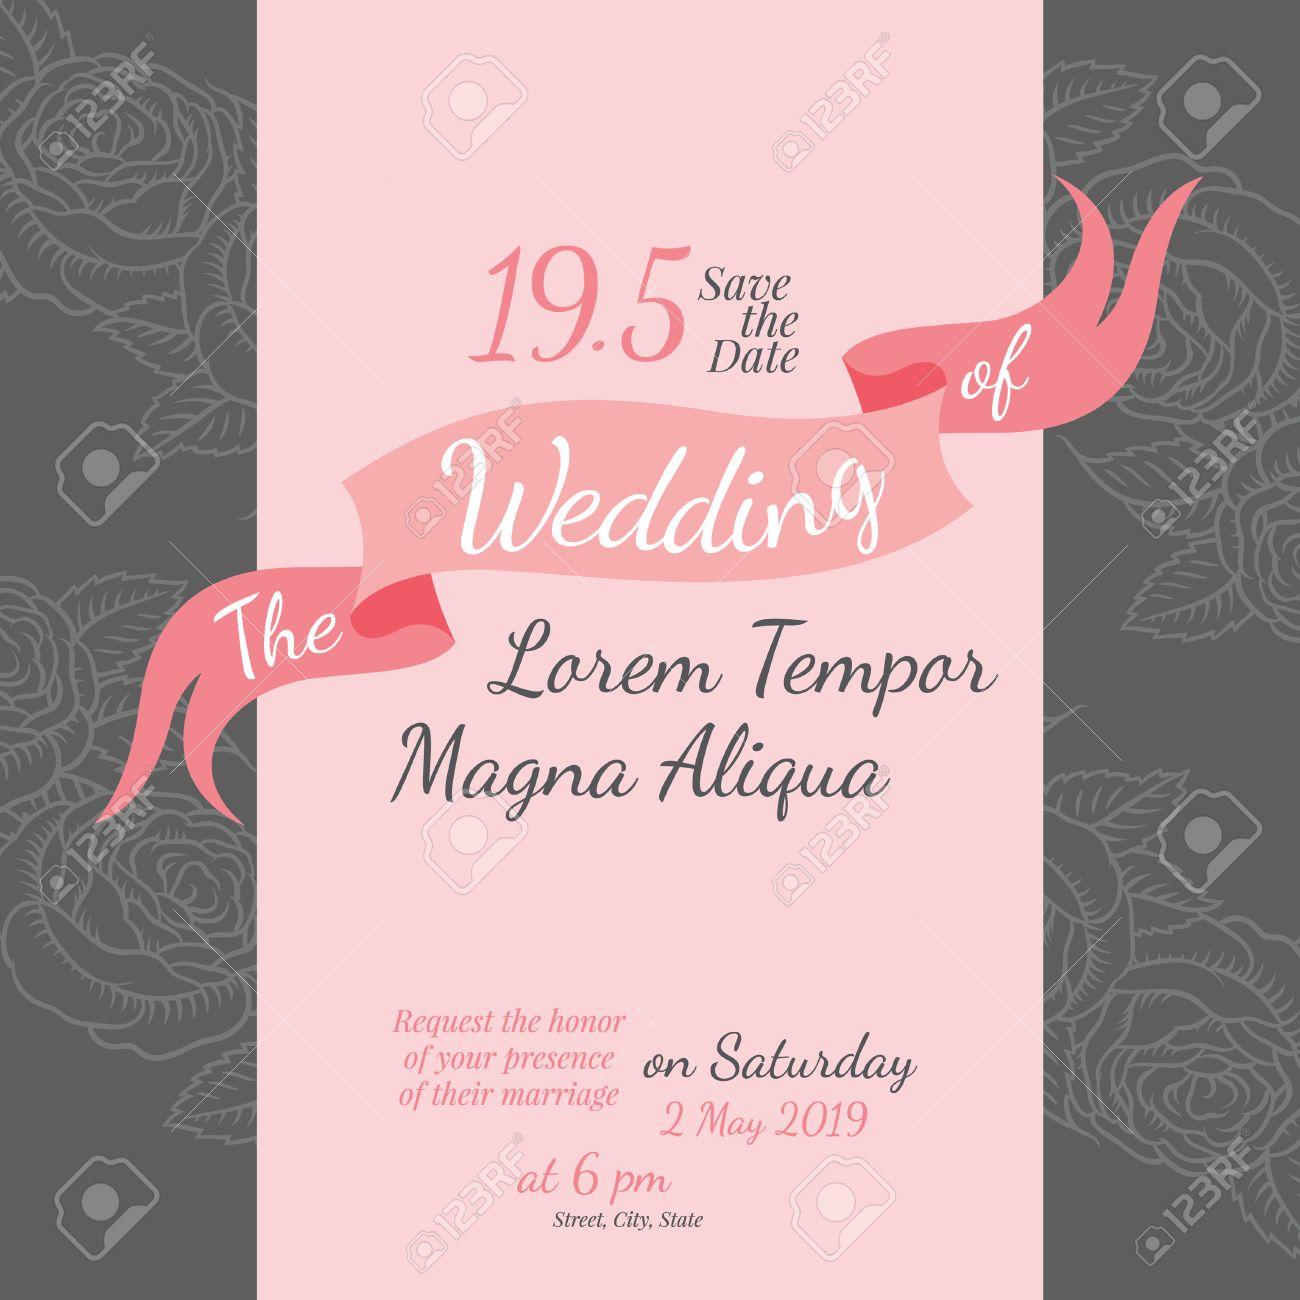 Invitation Bridal Shower Card With Rose Flower Vector Template - Bridal shower flyer template